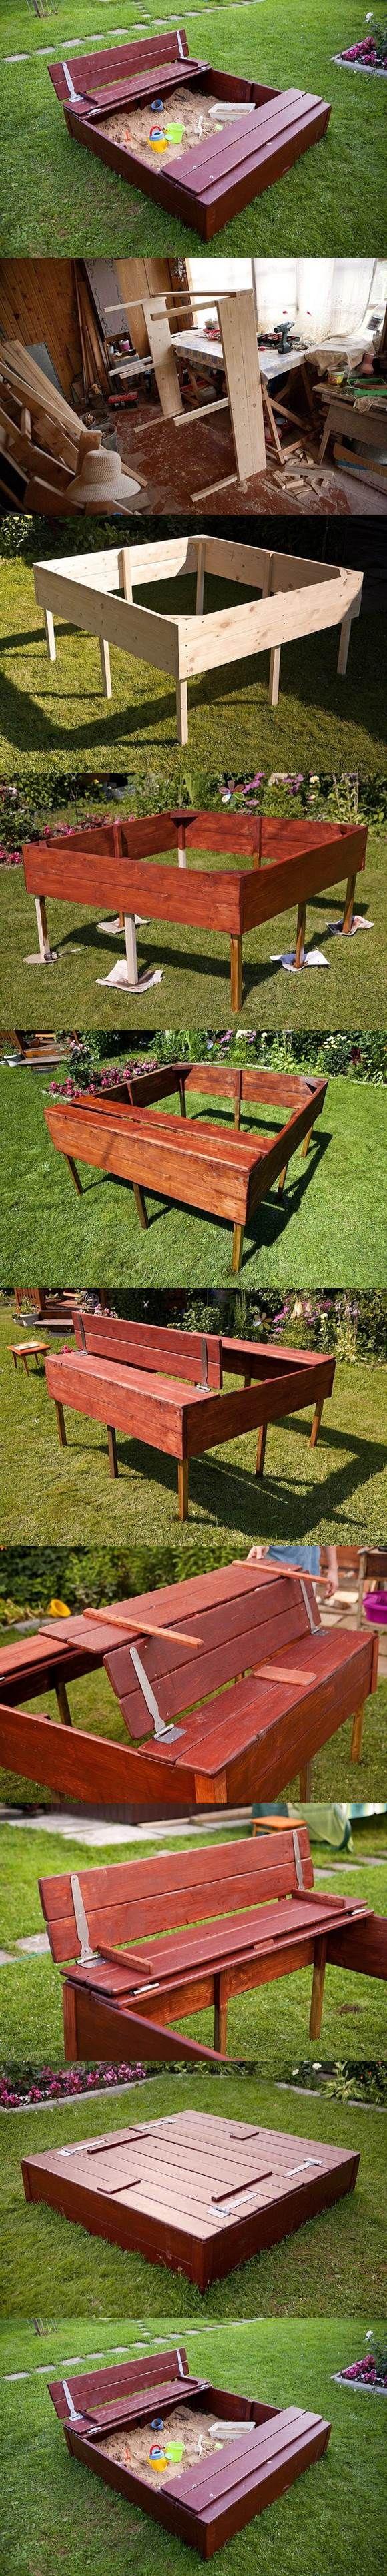 DIY Nice Sandbox for Kids | iCreativeIdeas.com Follow Us on Facebook --> https://www.facebook.com/icreativeideas